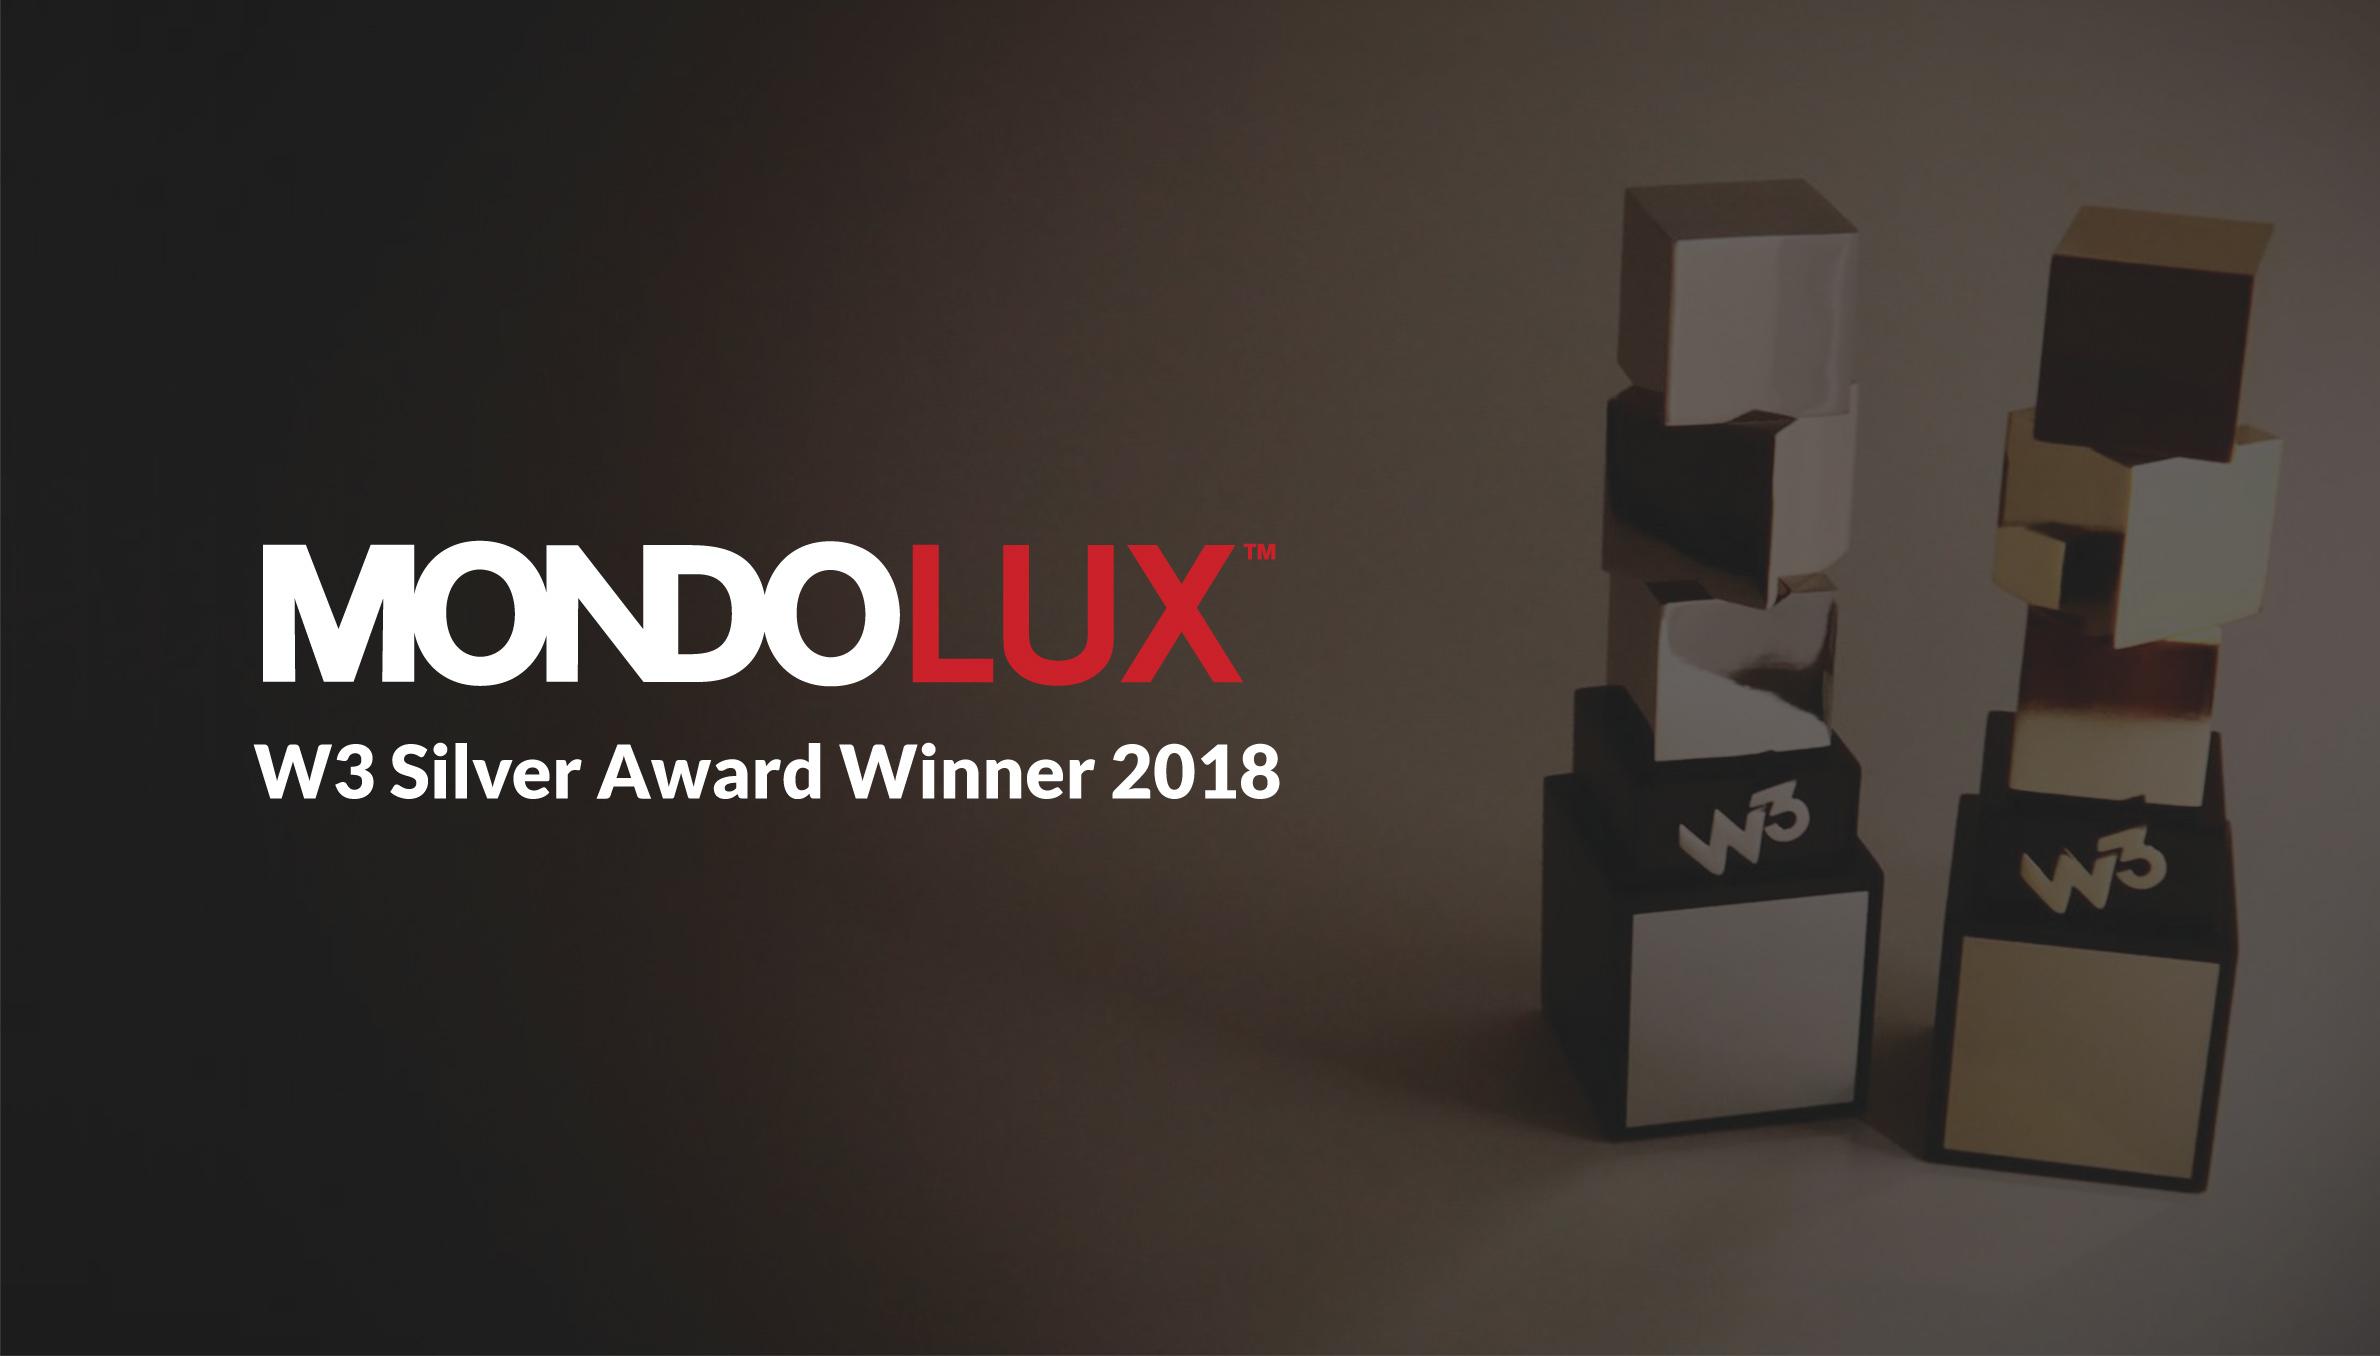 W3-Silver-Award-Mondolux.jpg#asset:18344